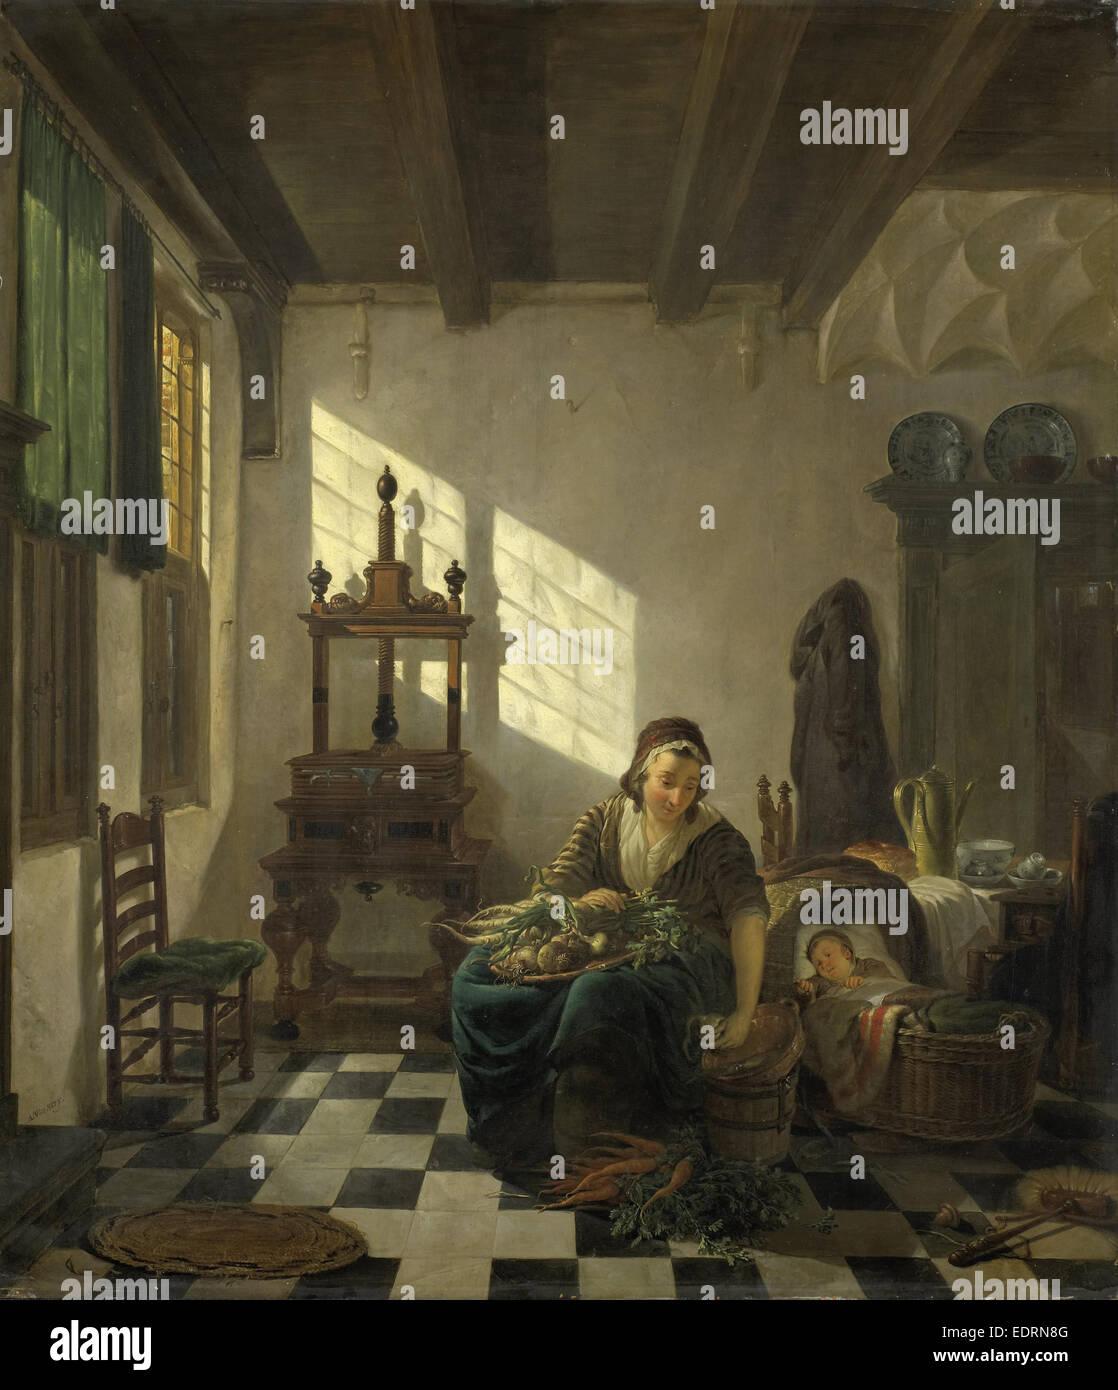 The Housewife, Abraham van Strij, I, 1800 - 1811 - Stock Image